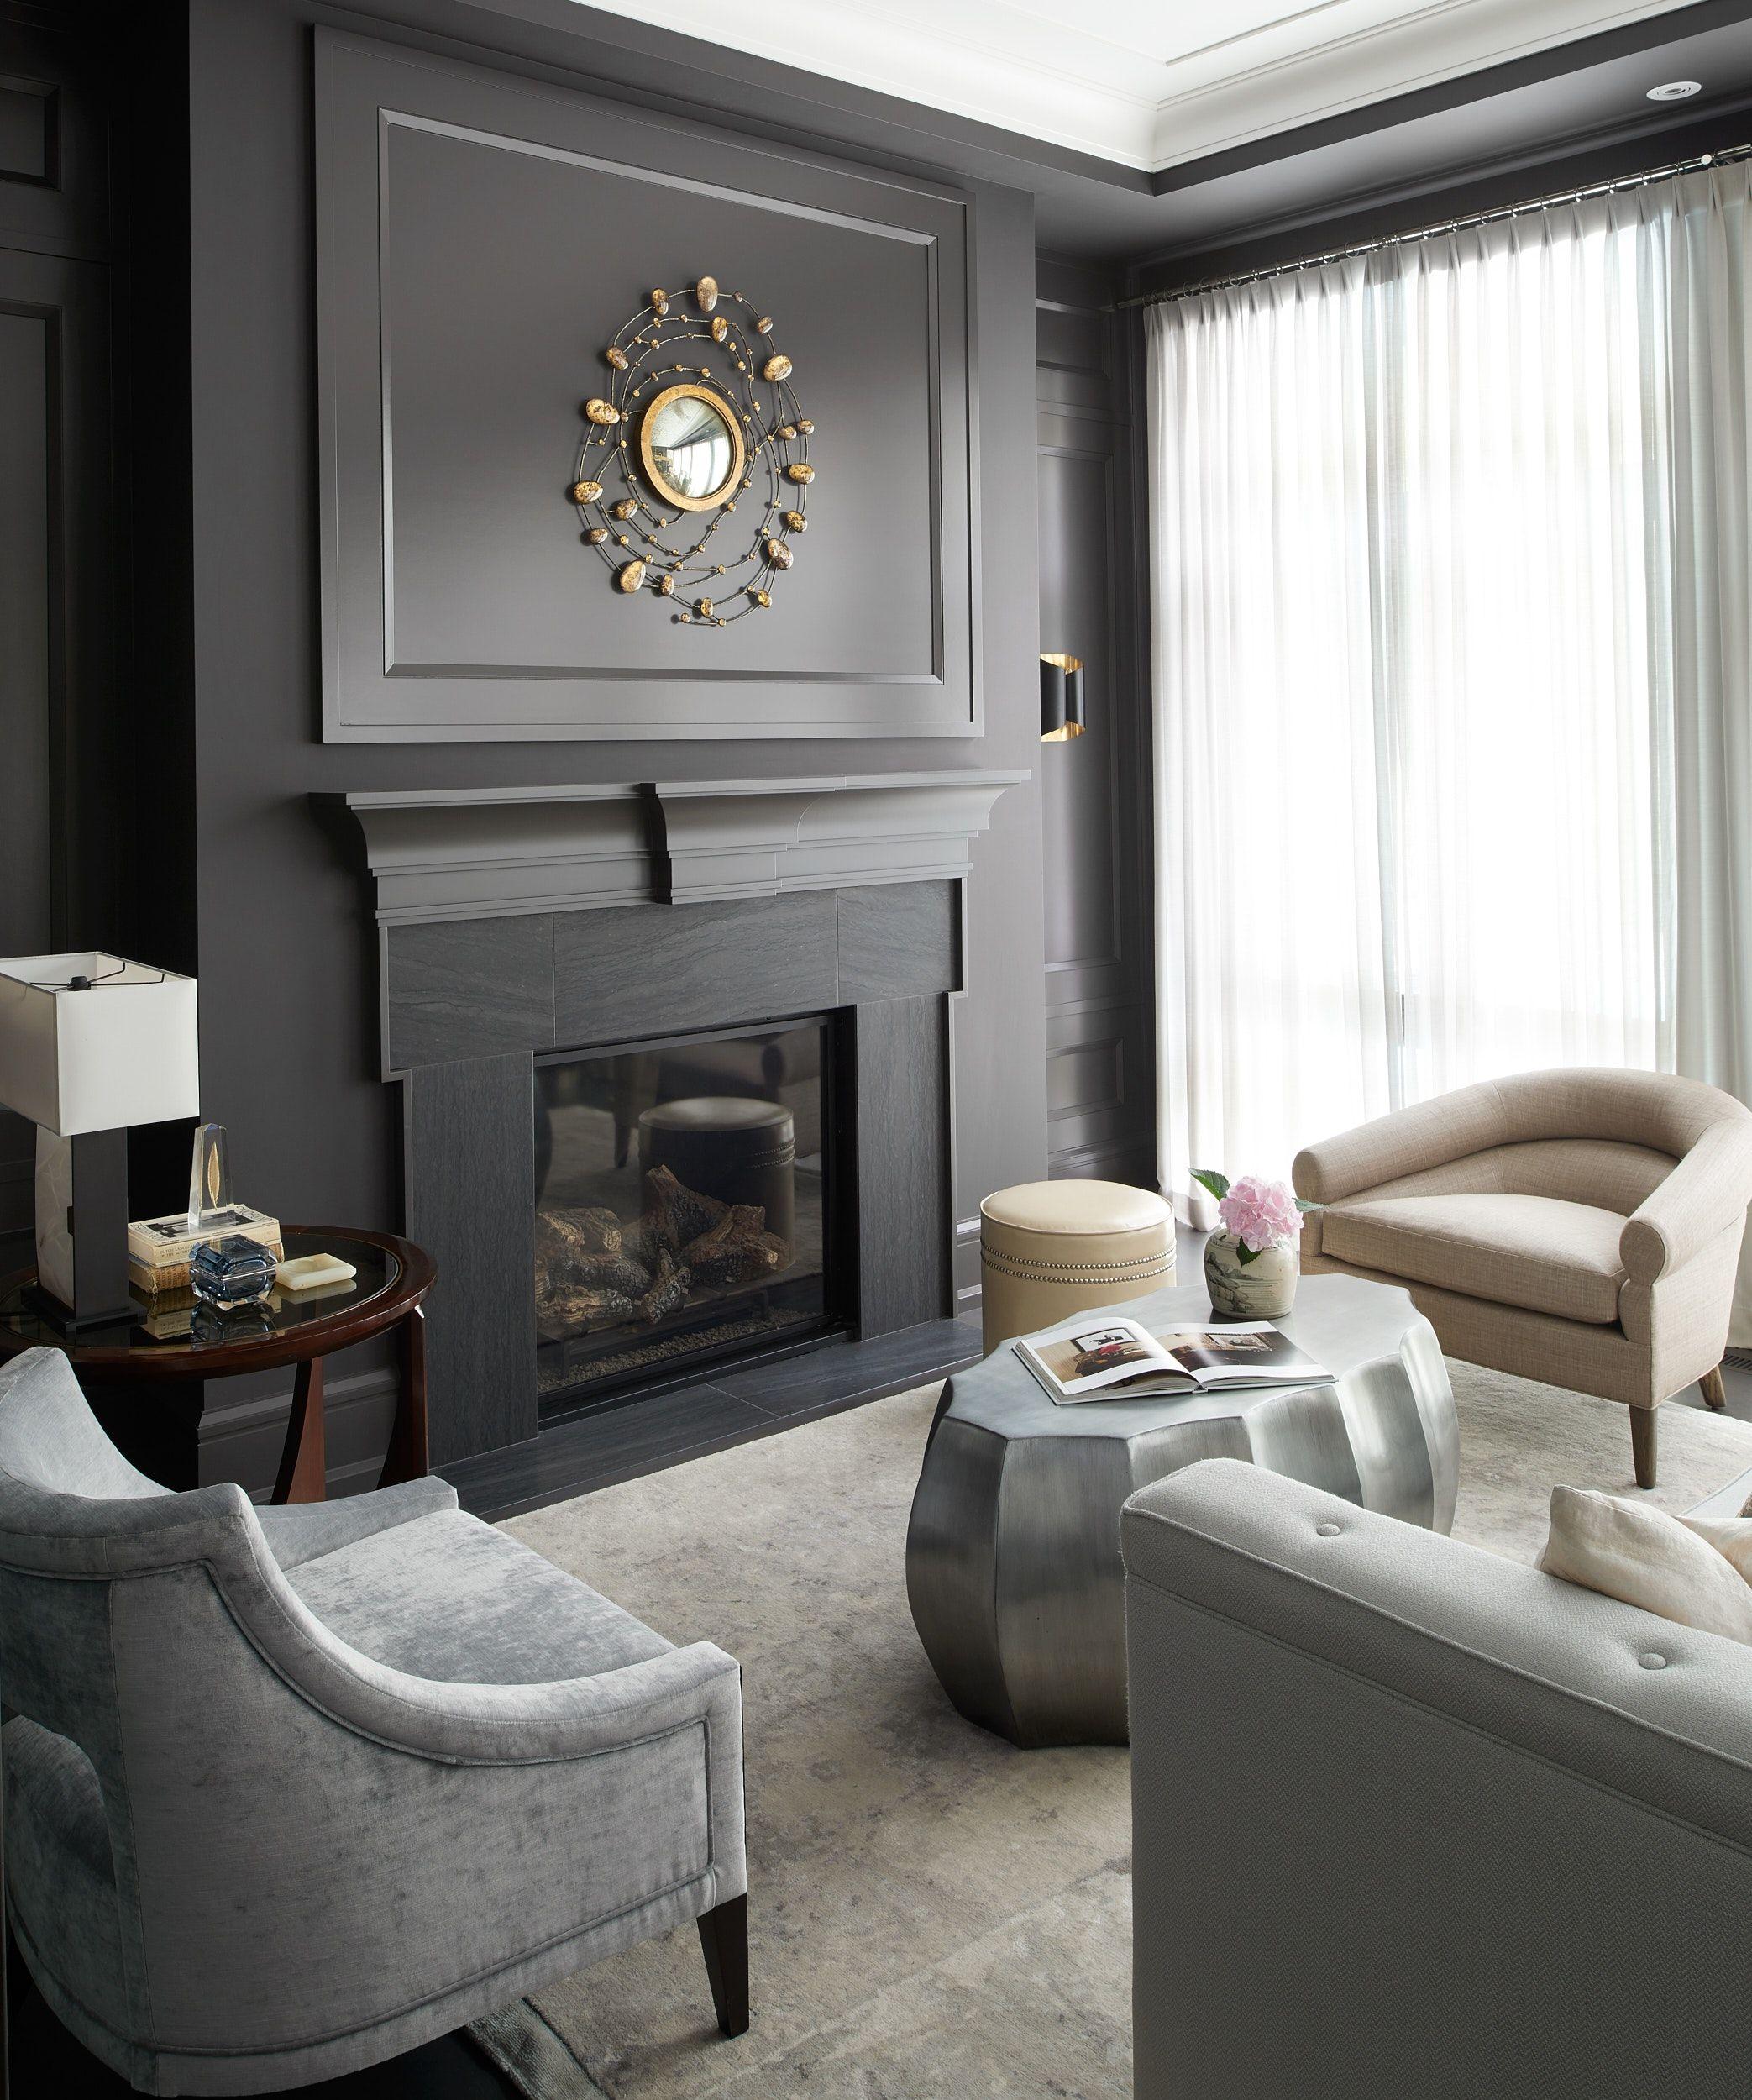 design portfolio interior create francisco how to copy san jacobs residential jerry